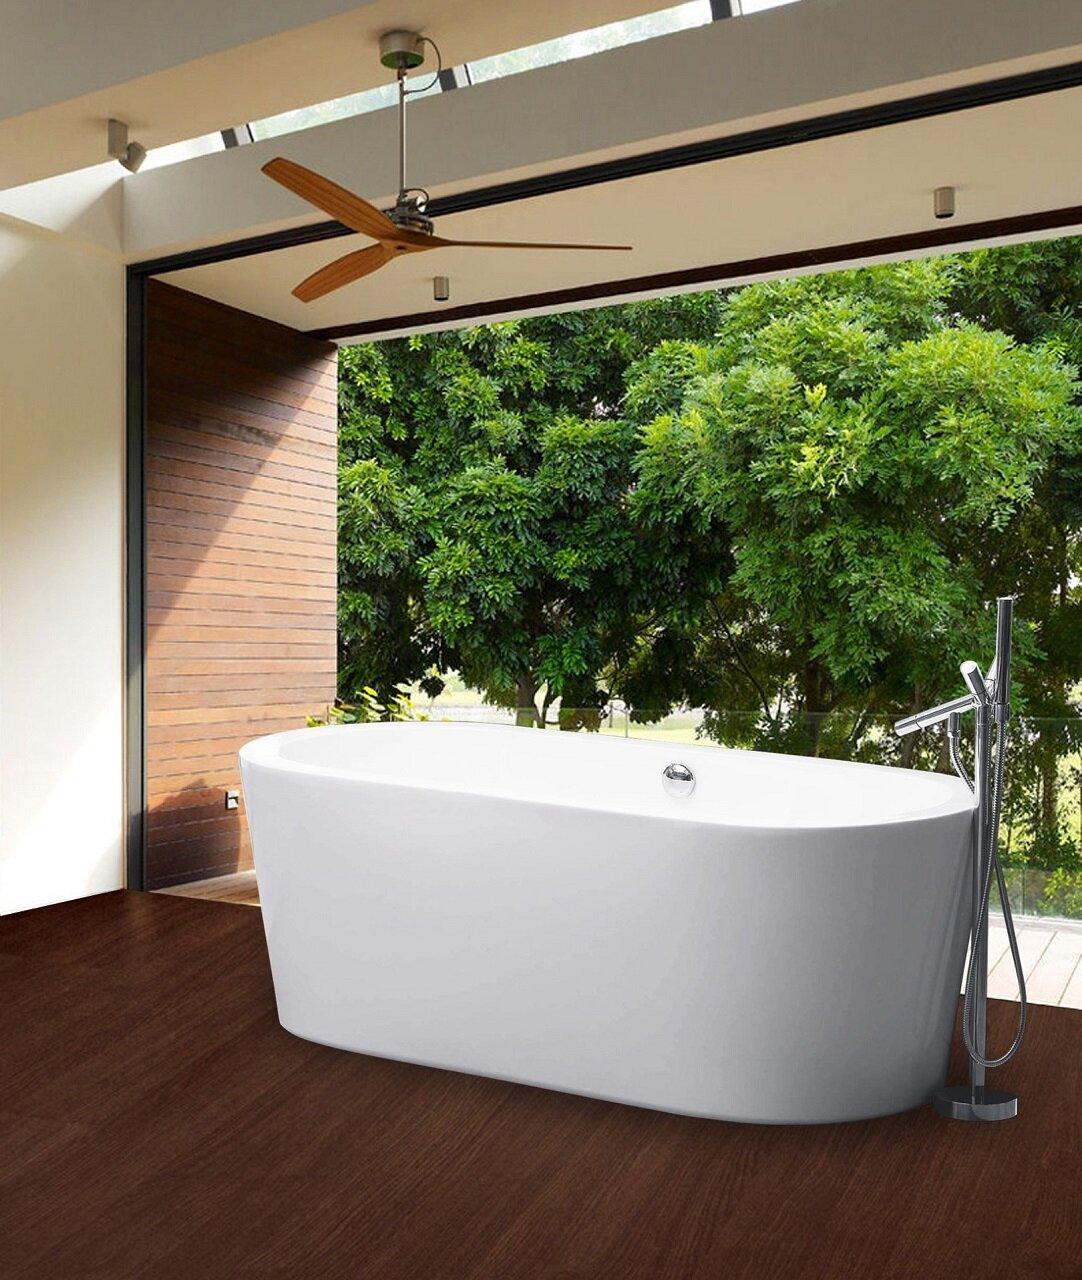 Funky Custom Bath Tubs Ideas - Bathtub Design Ideas - valtak.com